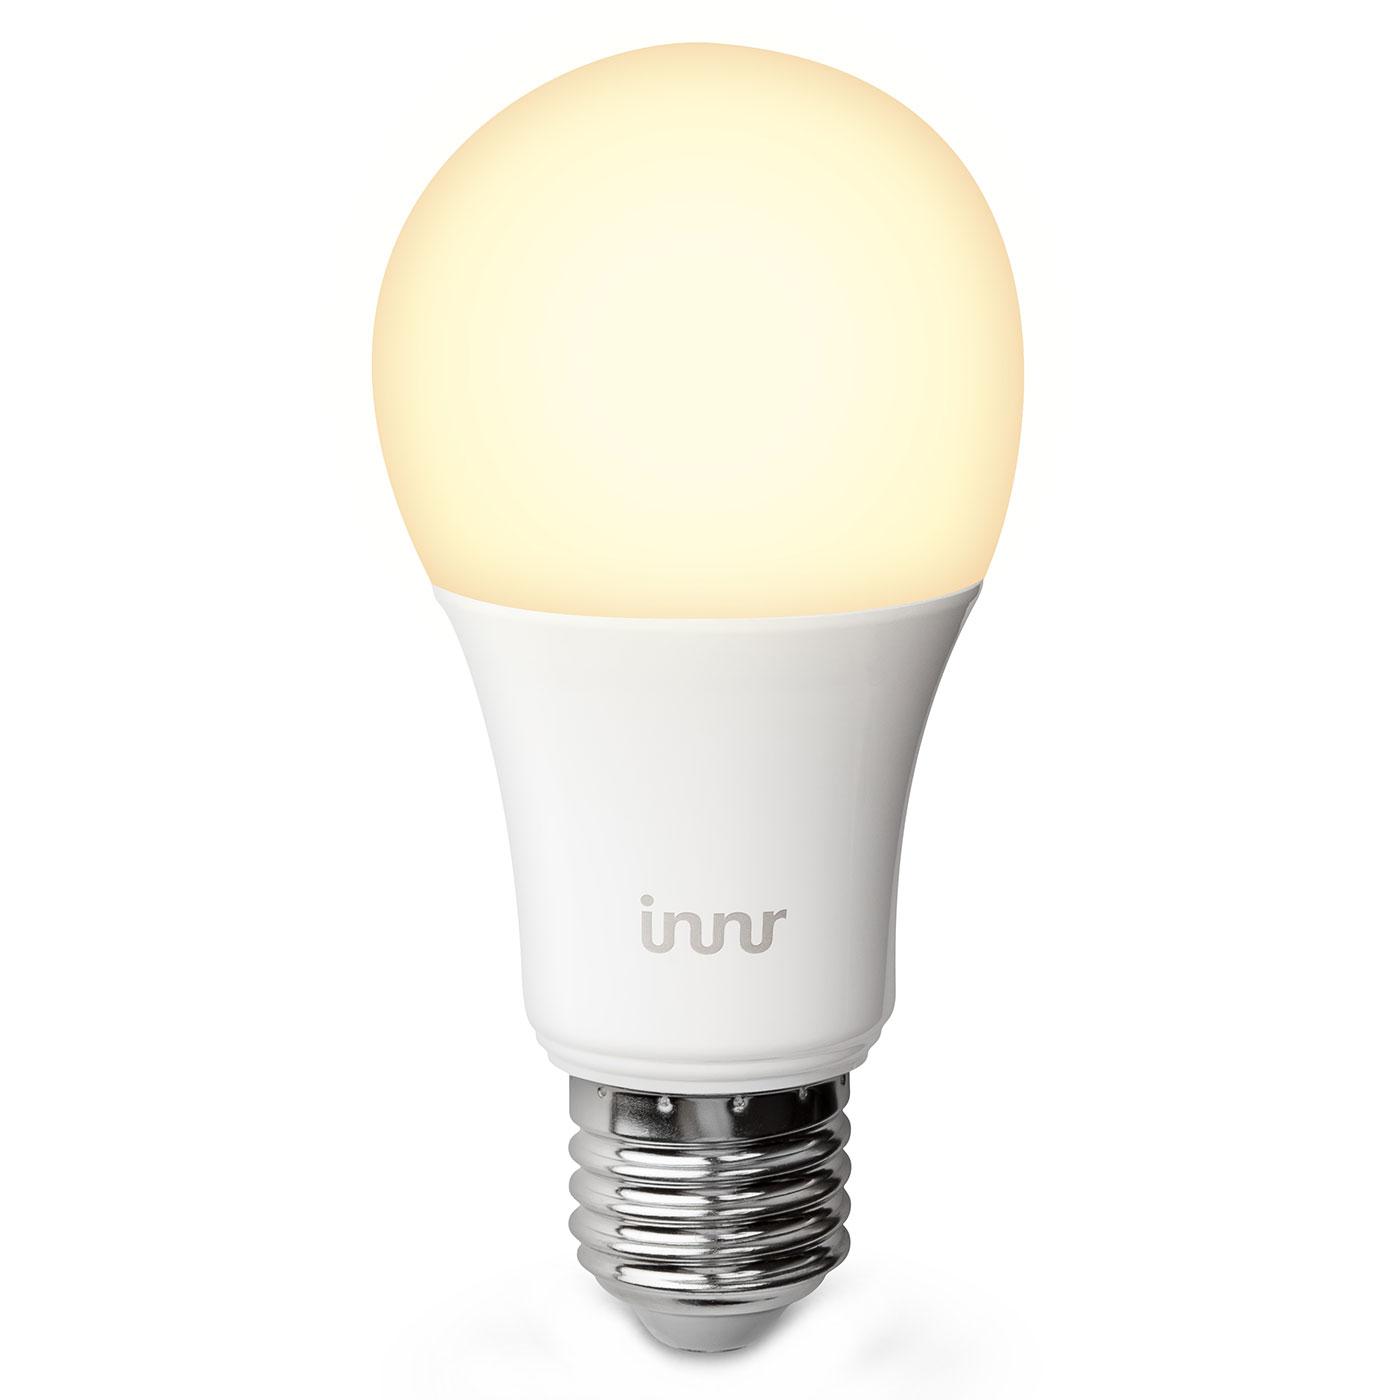 innr lightning smart bulb e27 b22 blanc chaud ampoule connect e innr sur. Black Bedroom Furniture Sets. Home Design Ideas